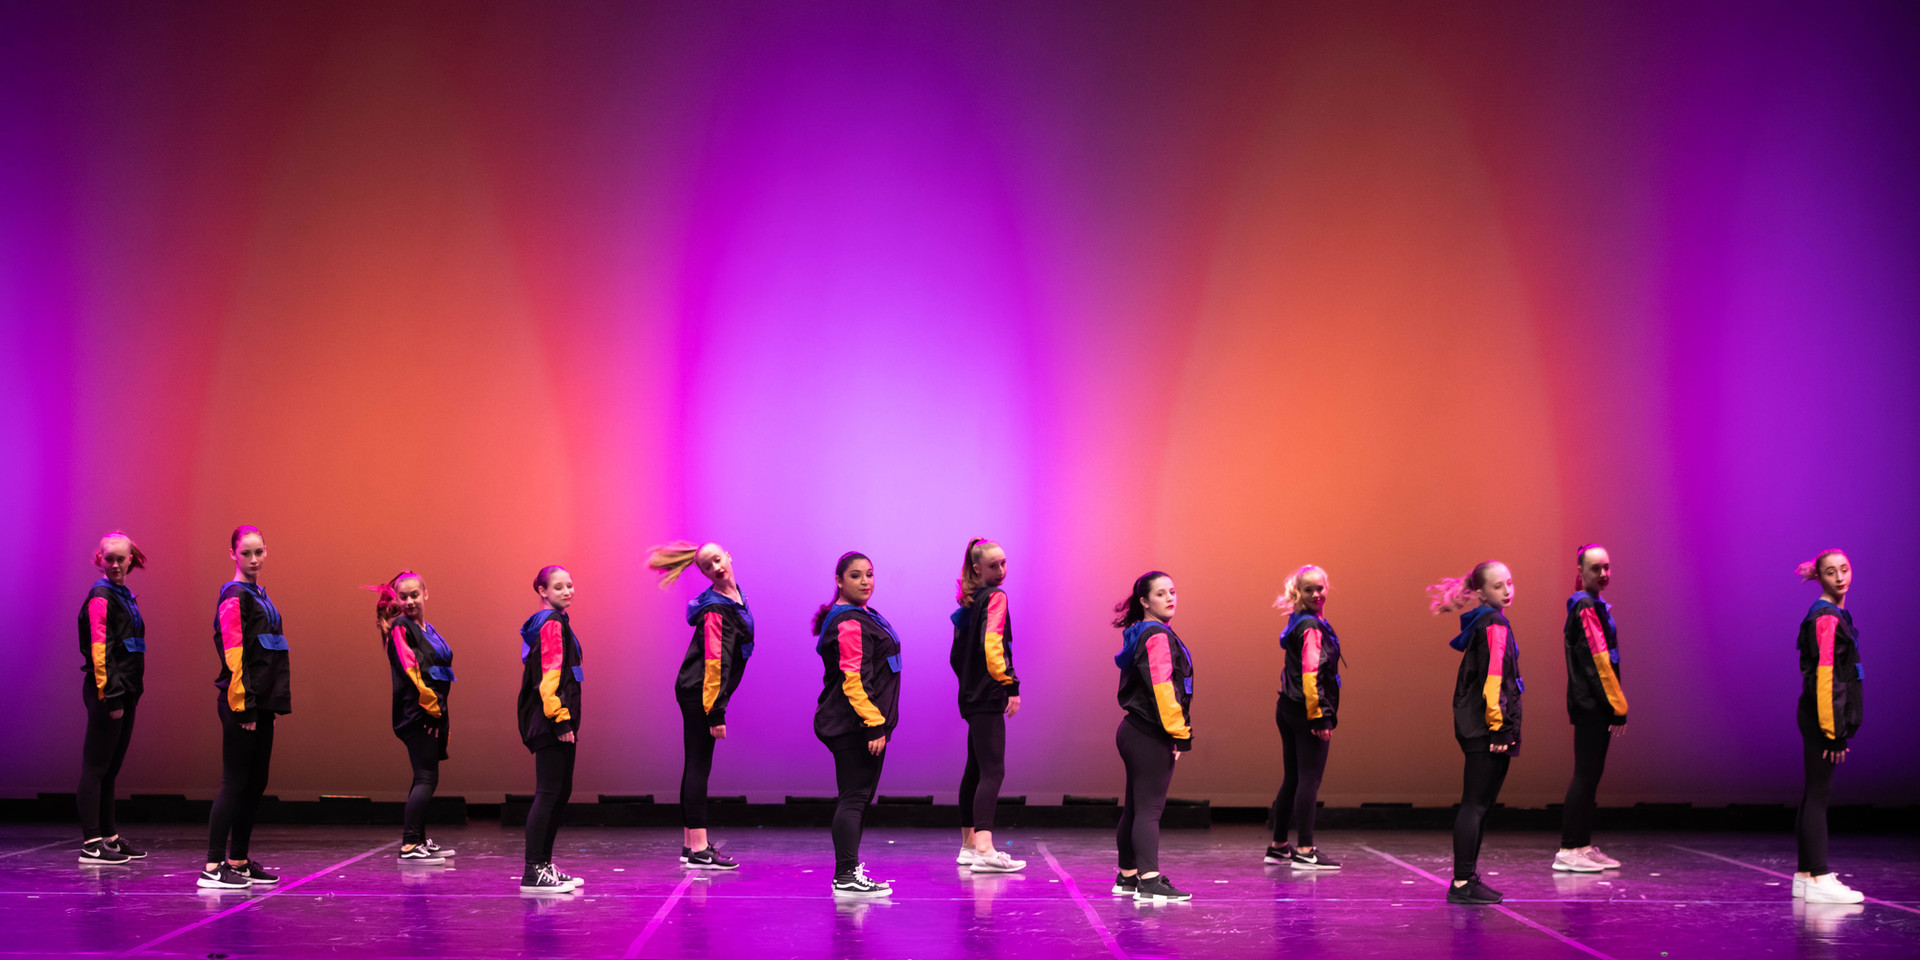 PADLock DANCE CREW